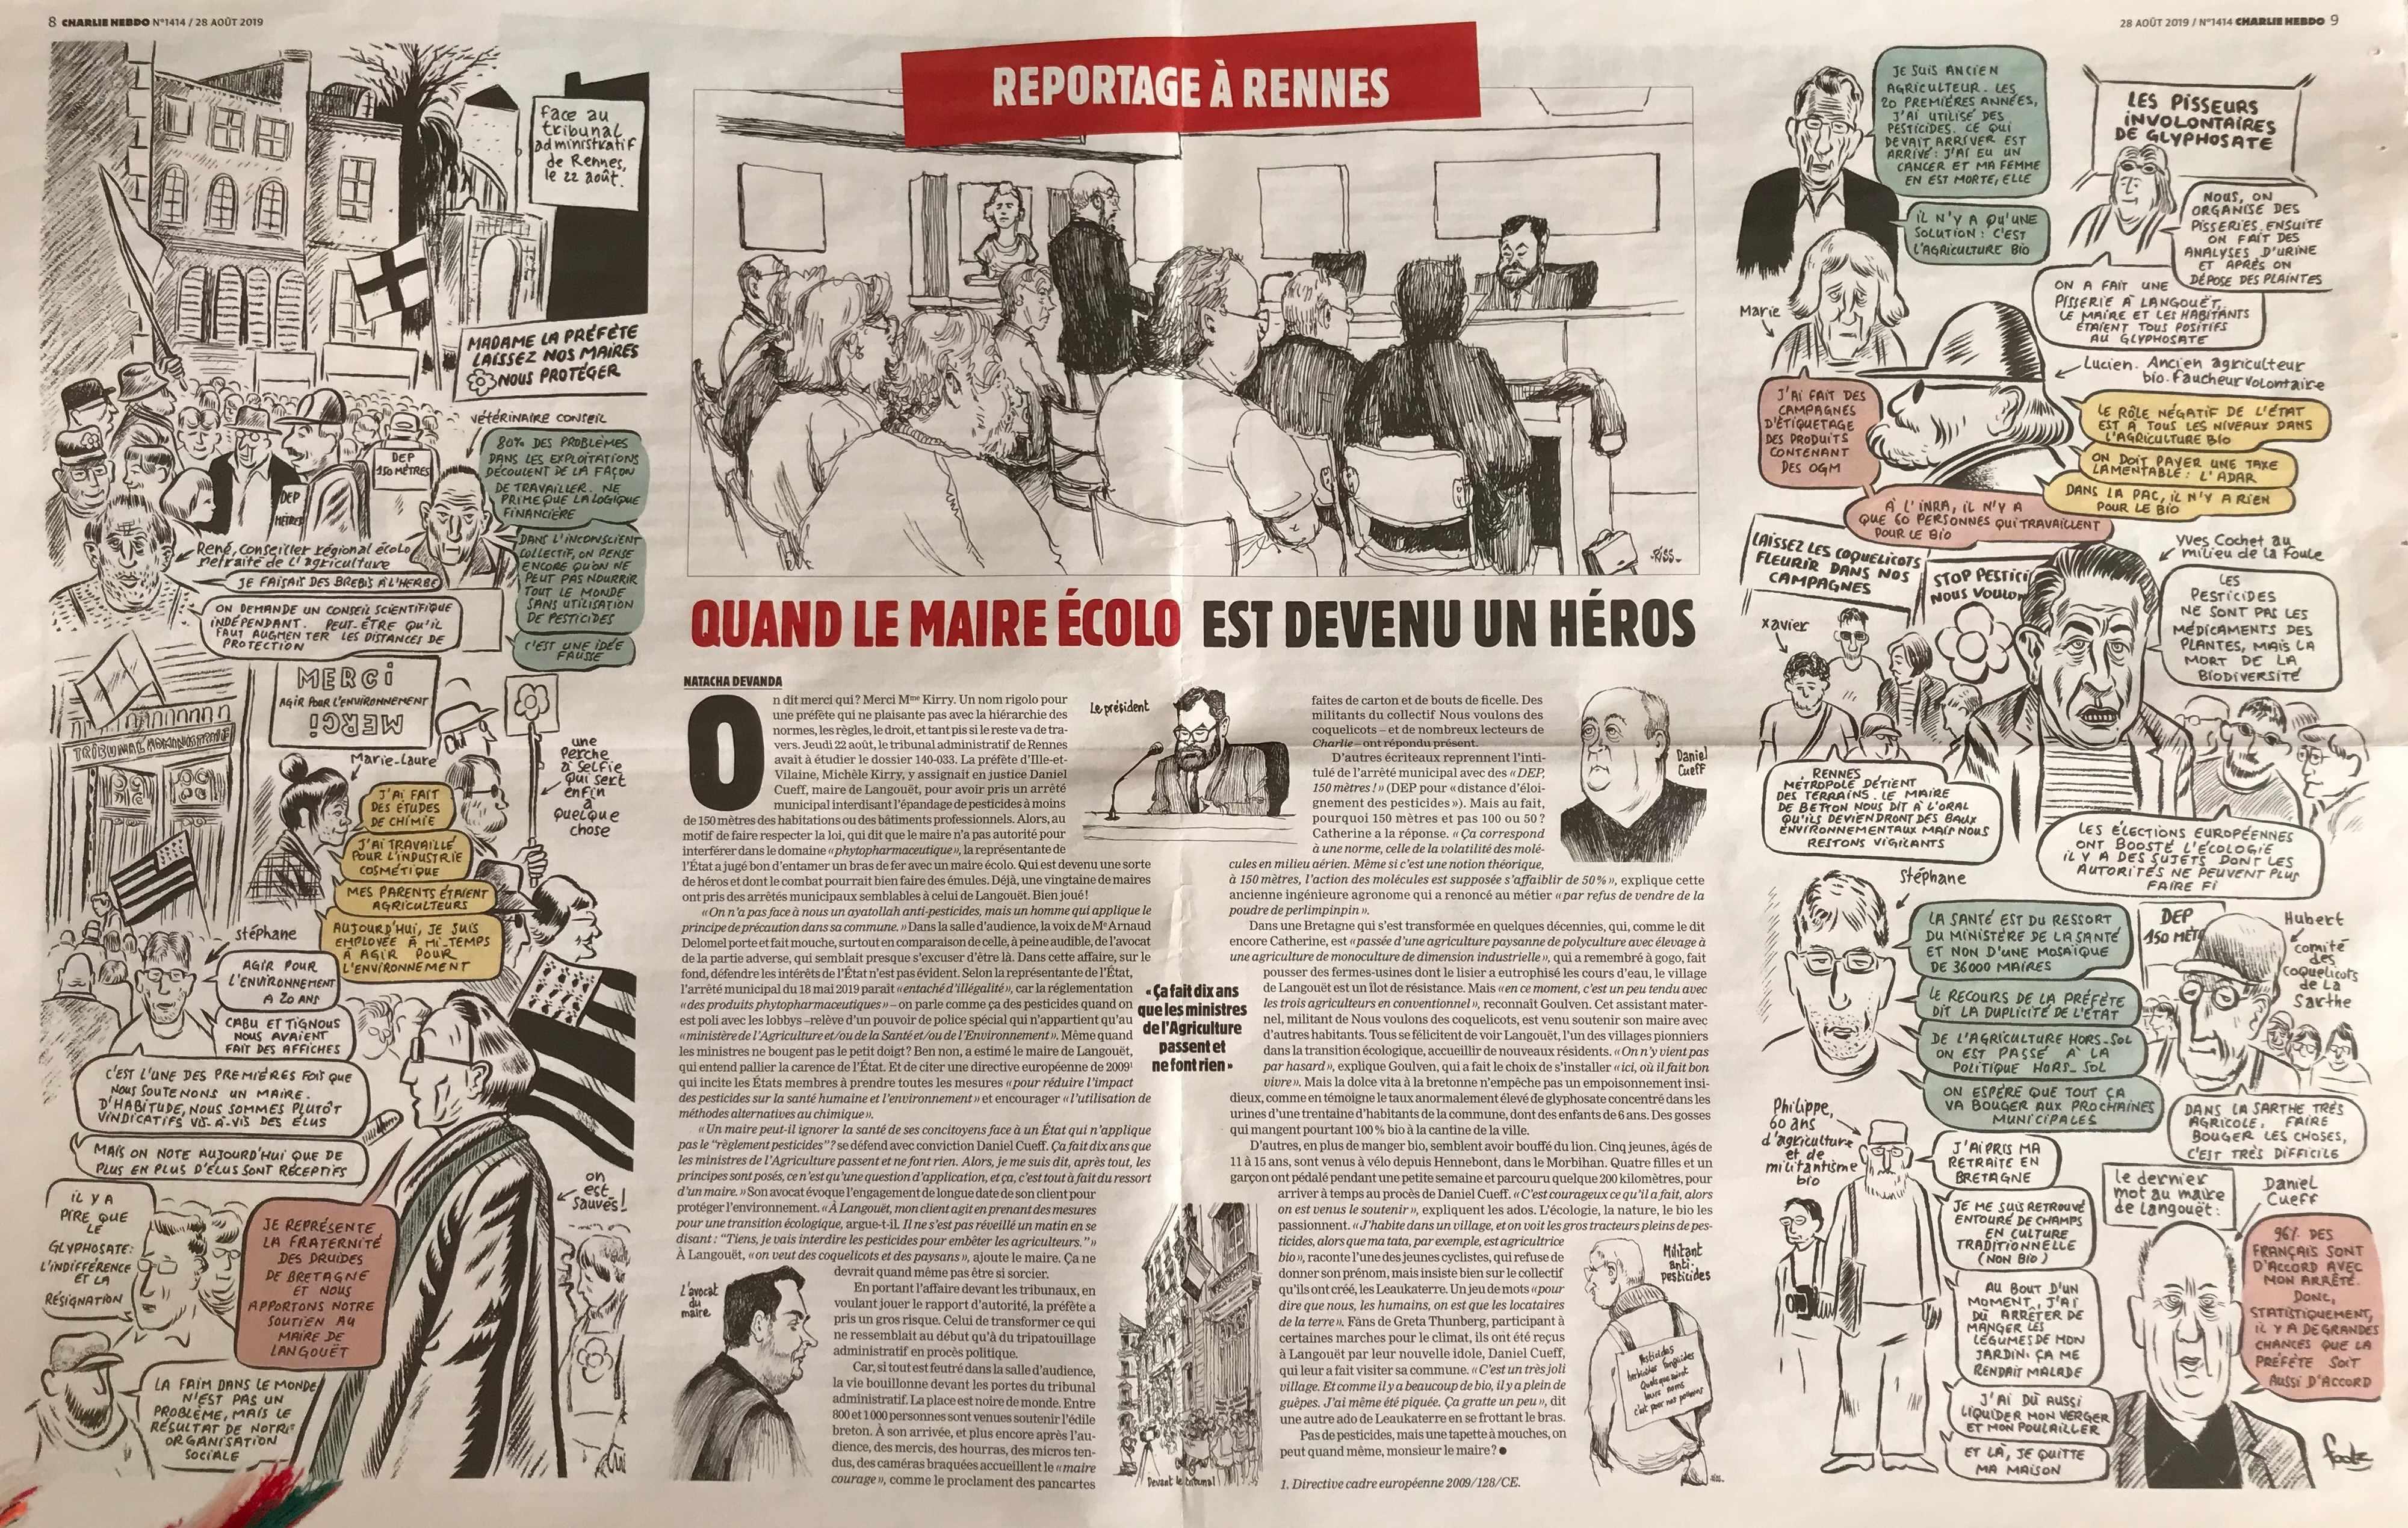 TA Rennes 22 août 2019 vu par Charlie Hebdo